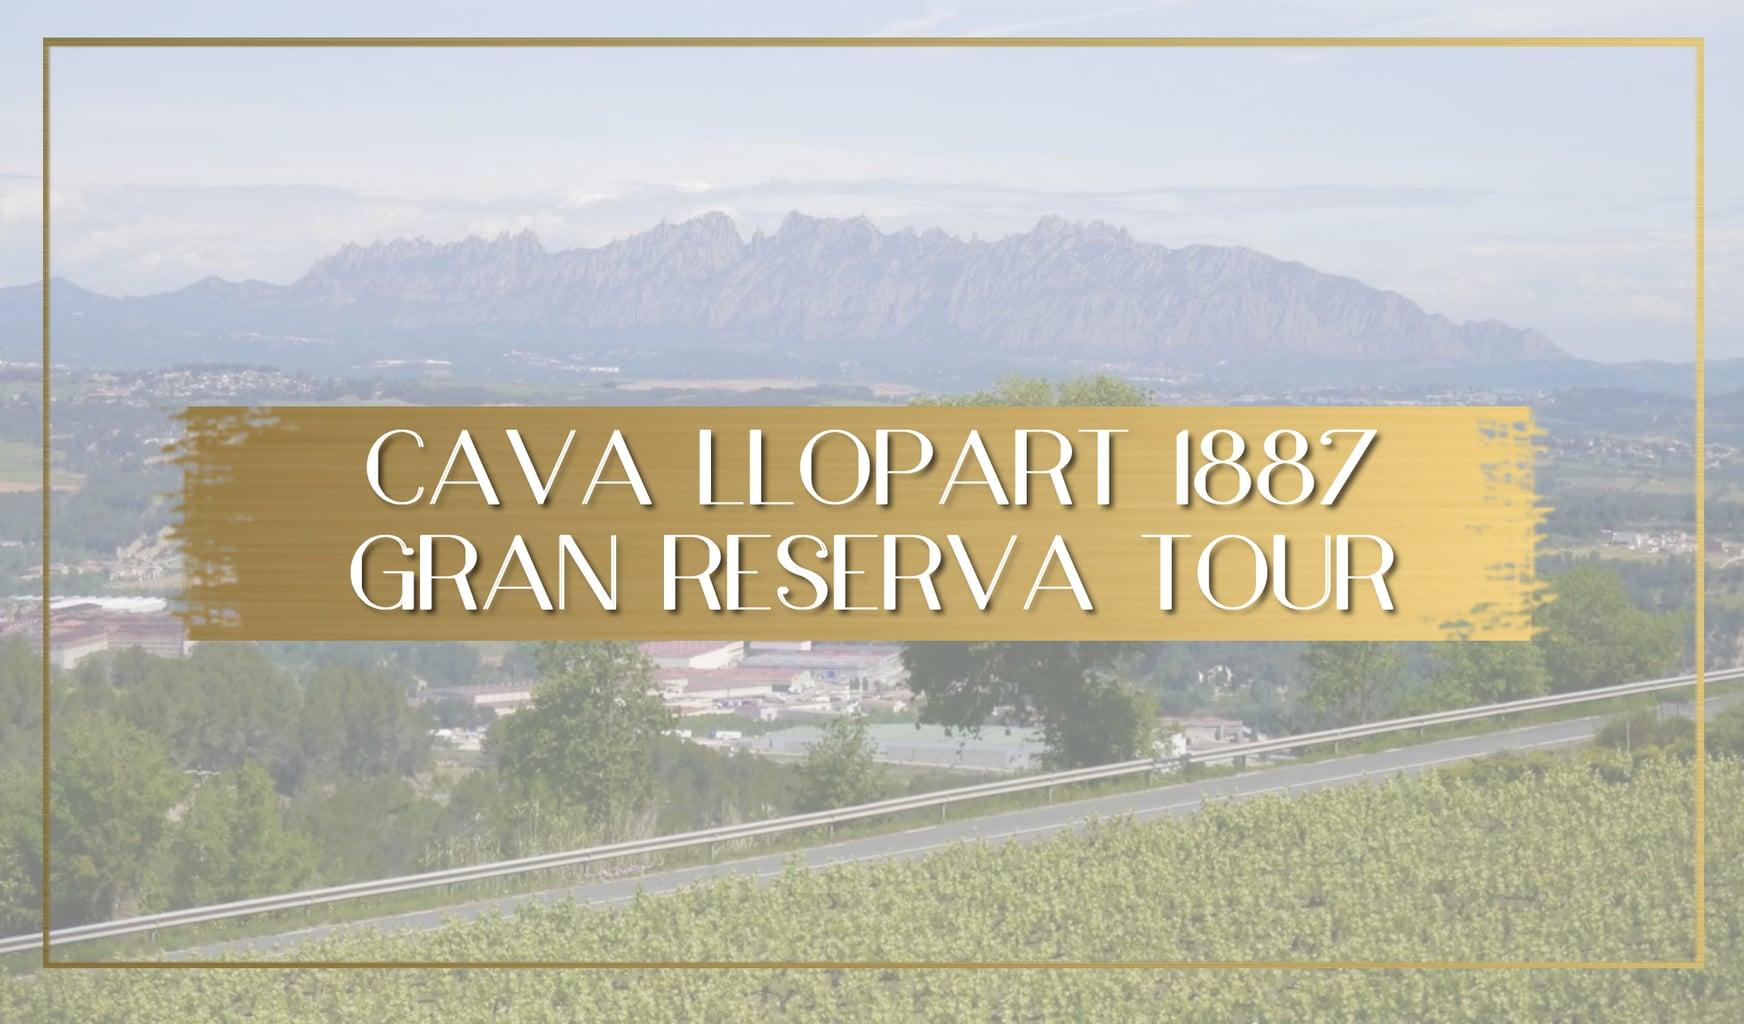 Cava Llopart 1887 Gran Reserva Tour main